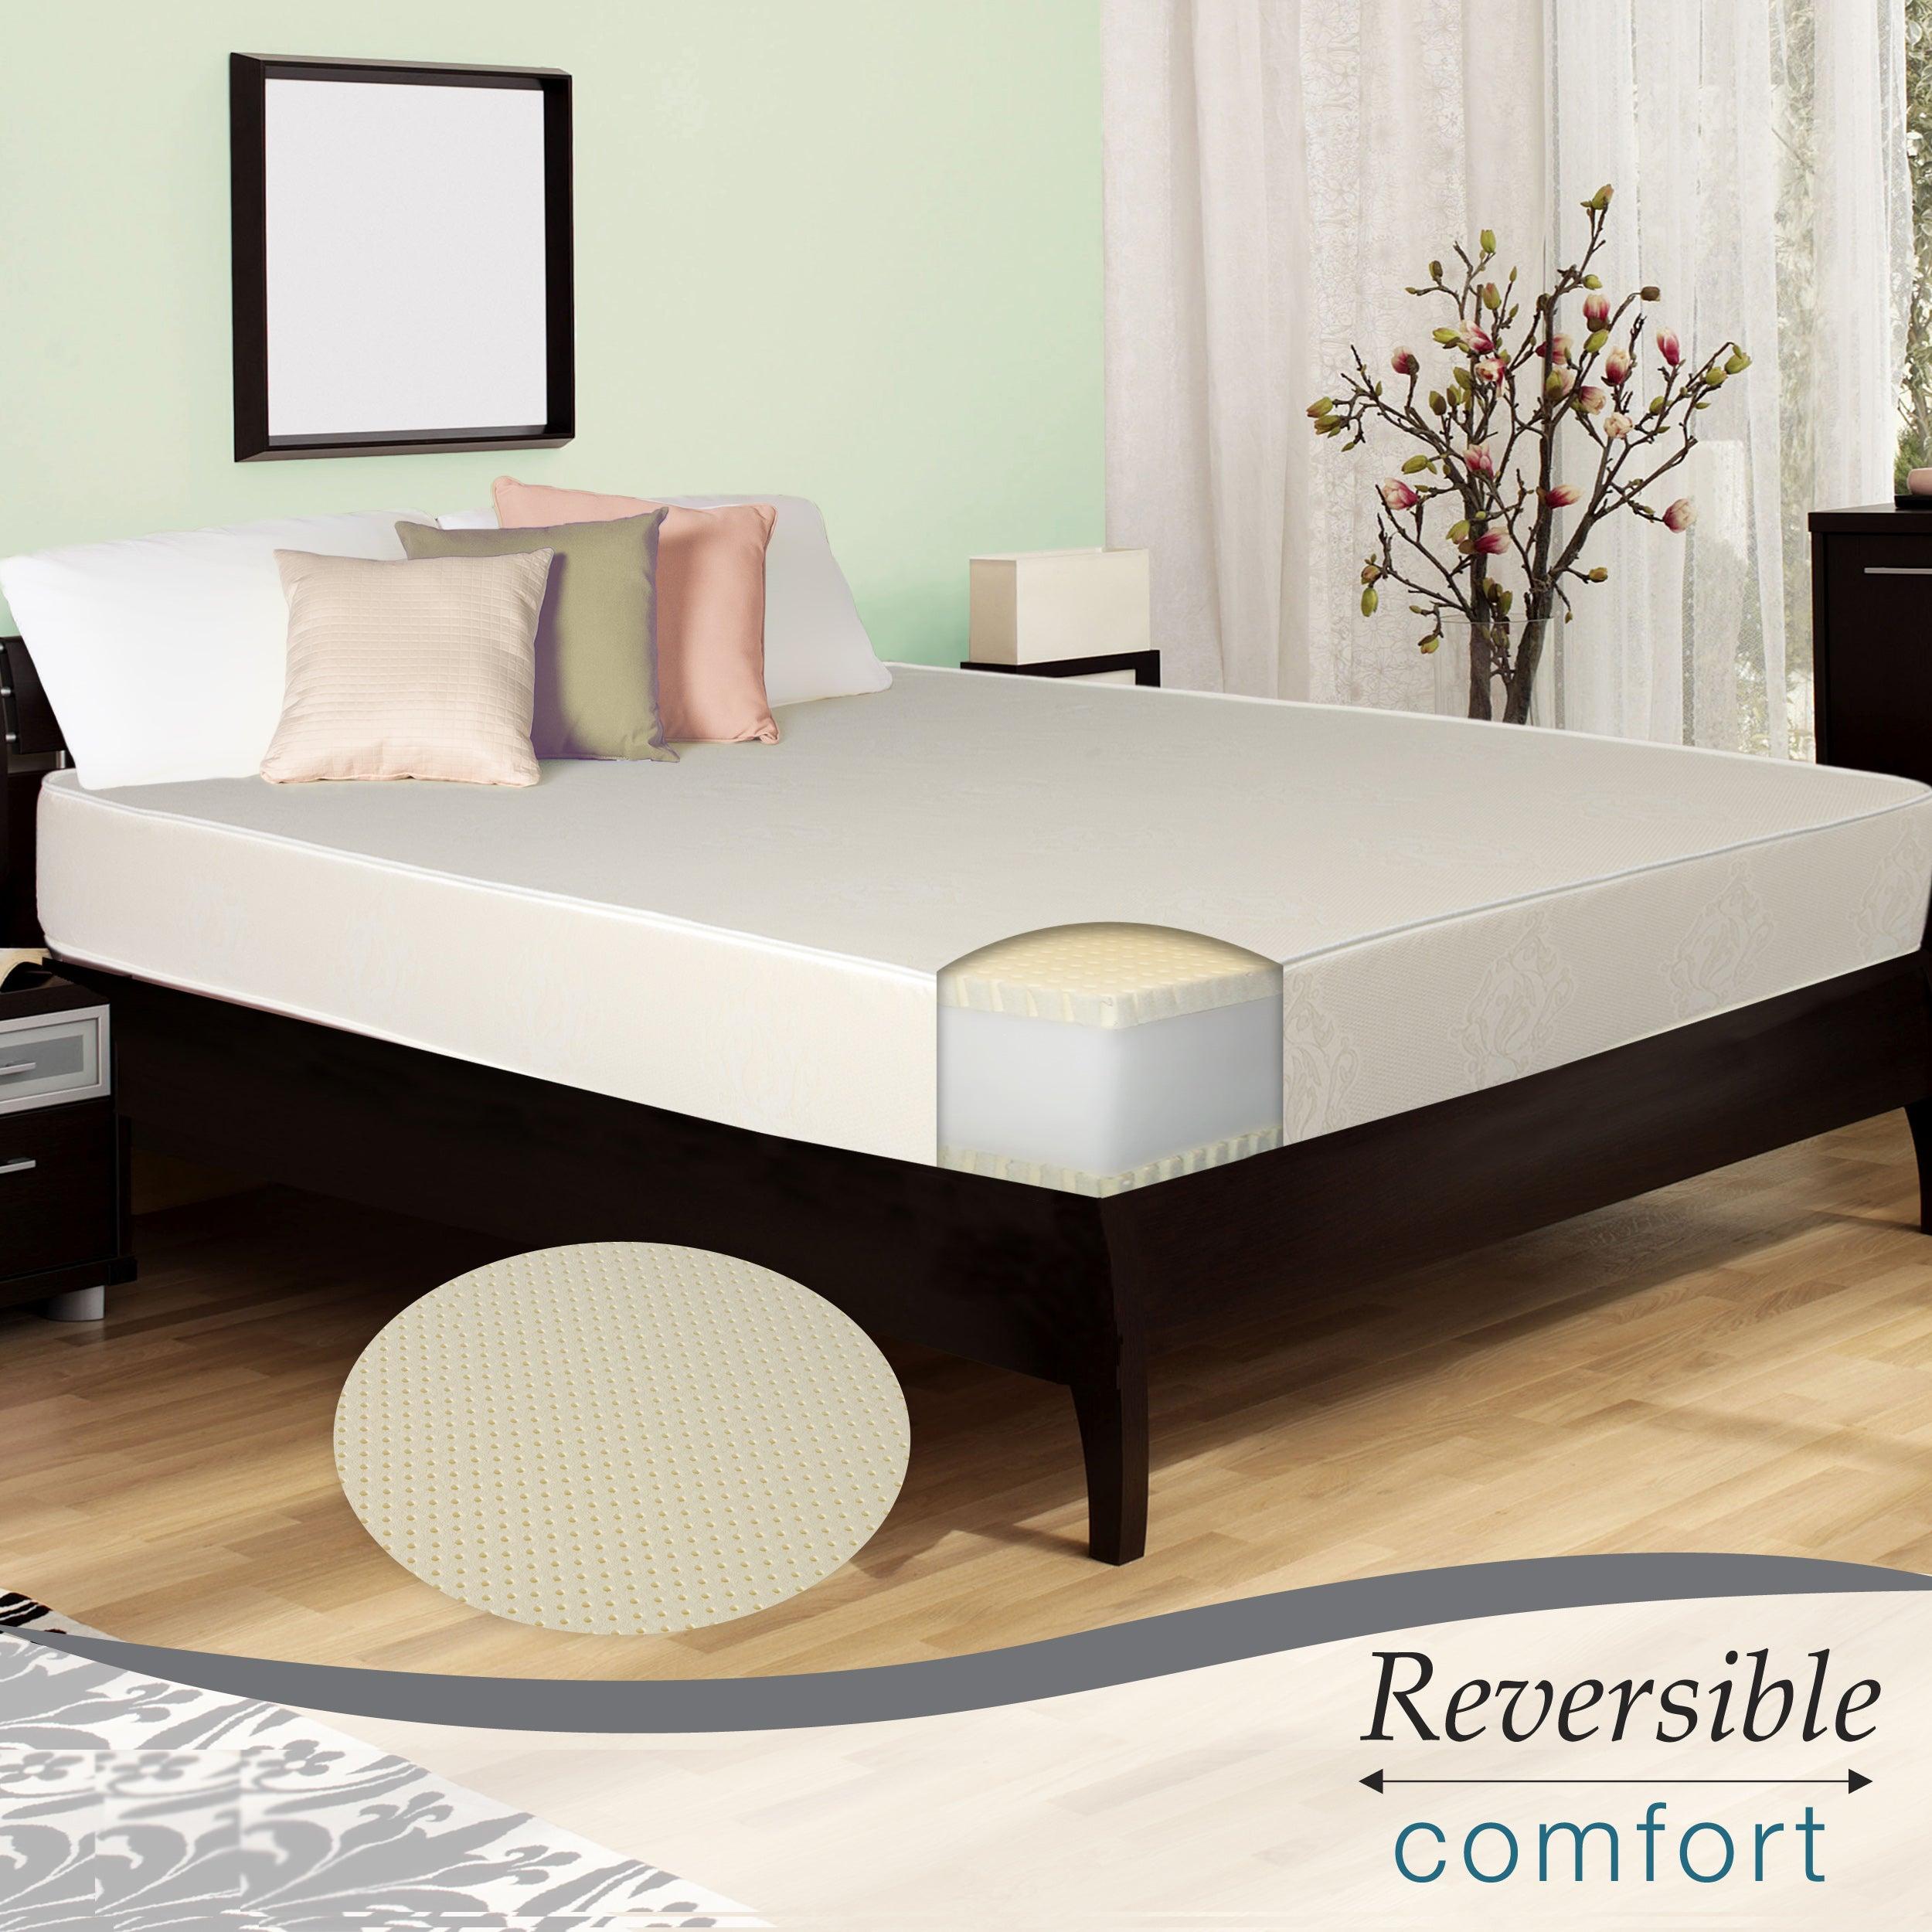 Select Luxury Reversible E.C.O. Latex Foam Medium Firm 10-inch King-size Mattress